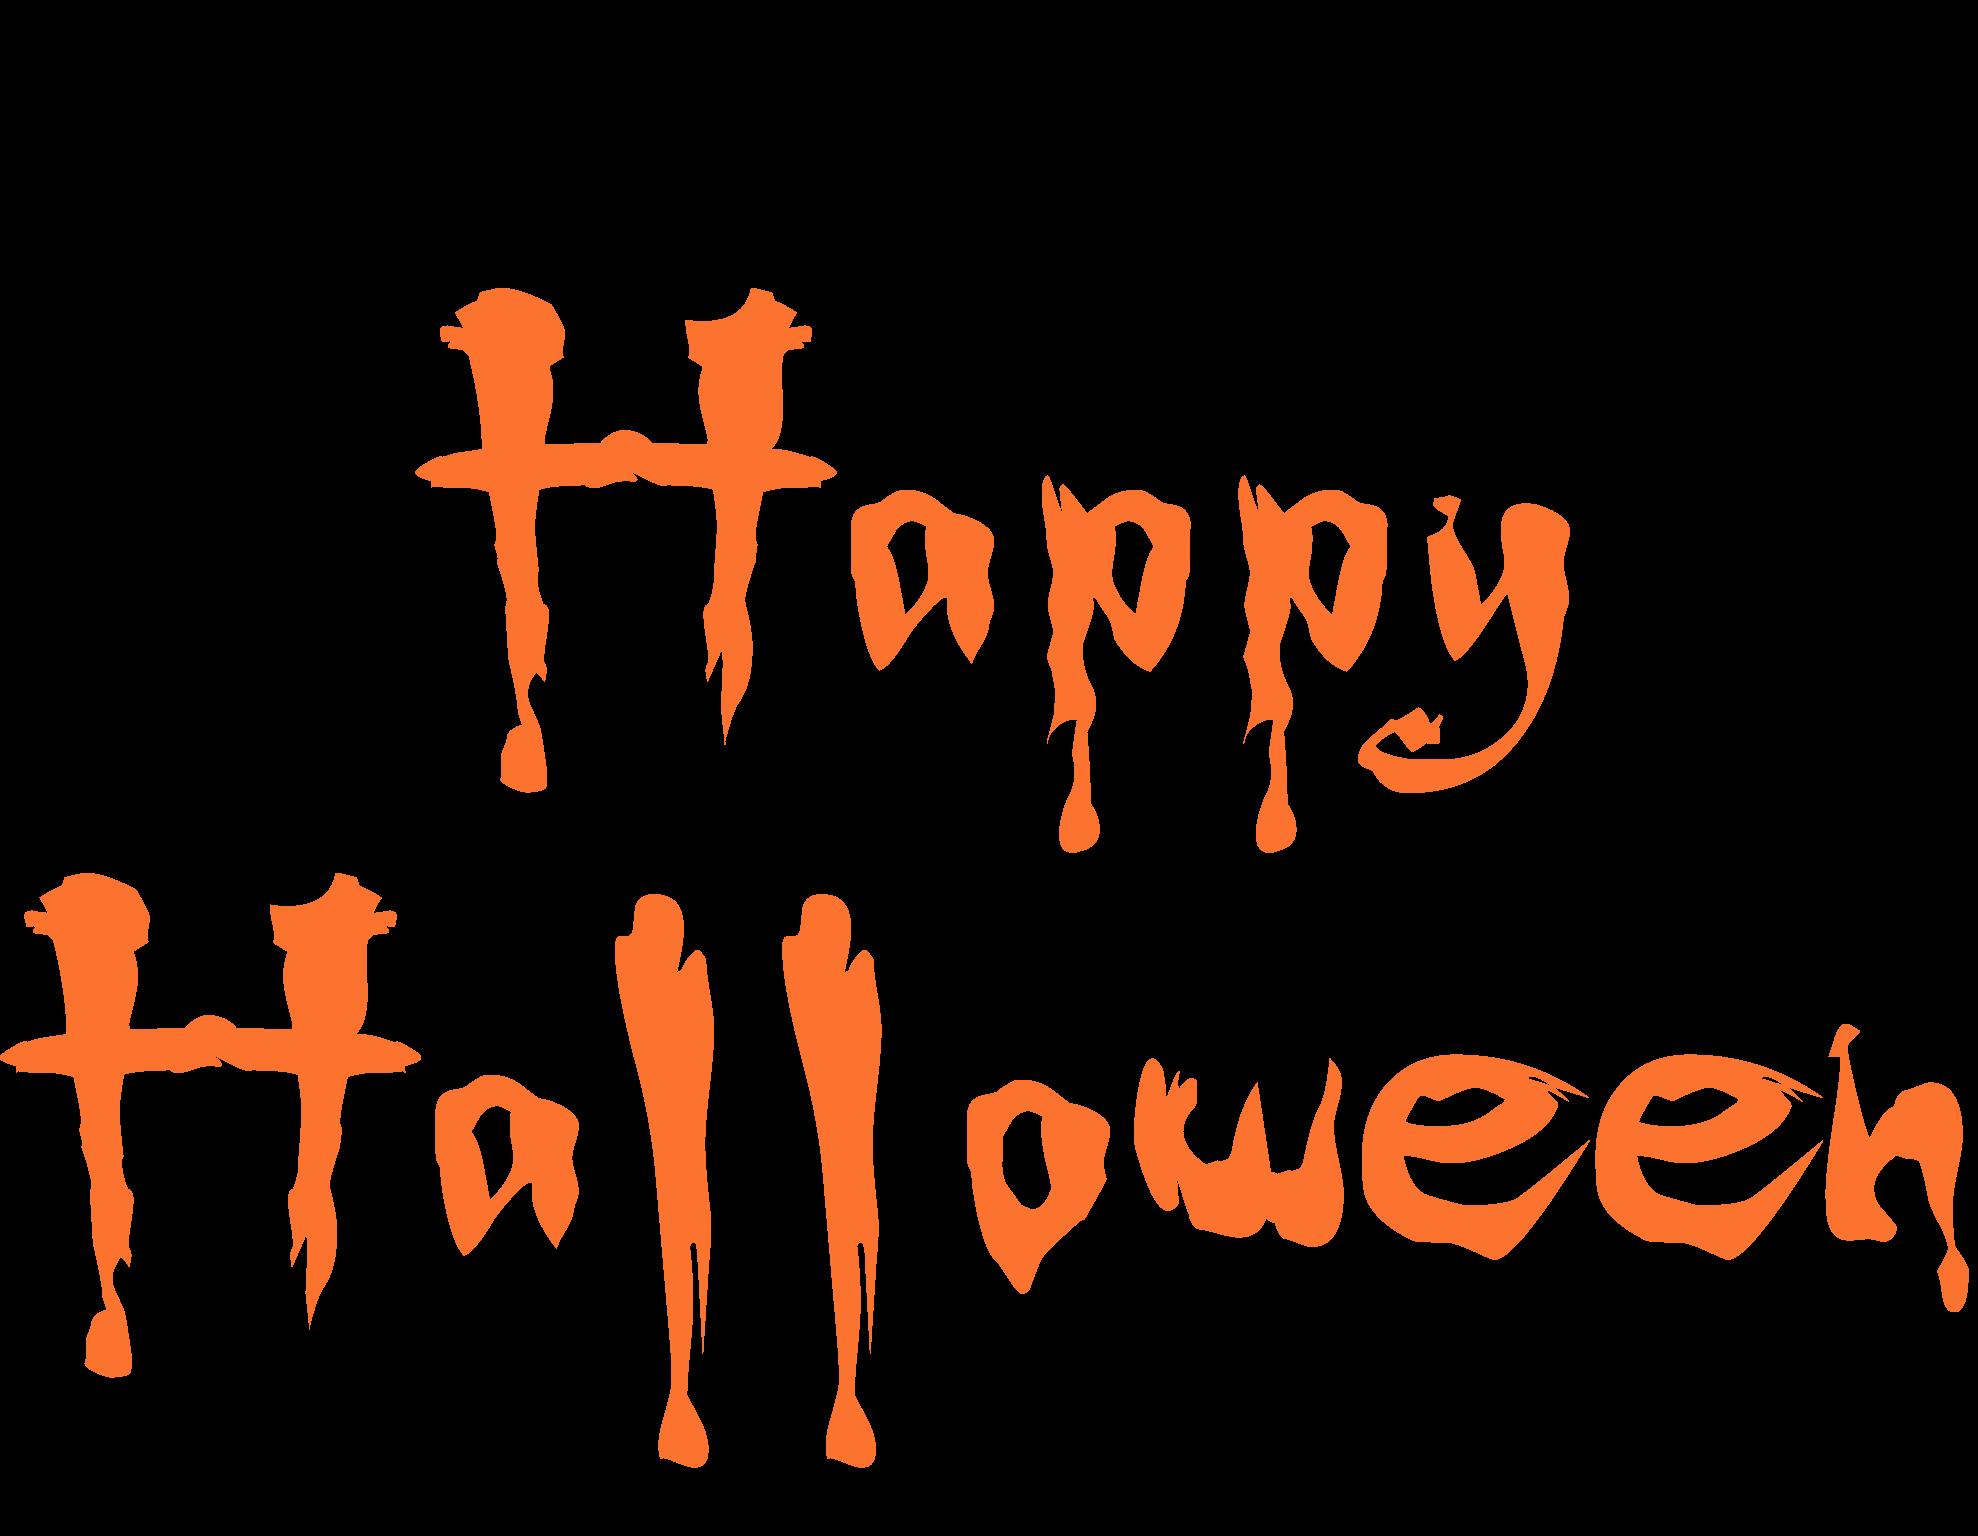 Happy Halloween con murciélagos